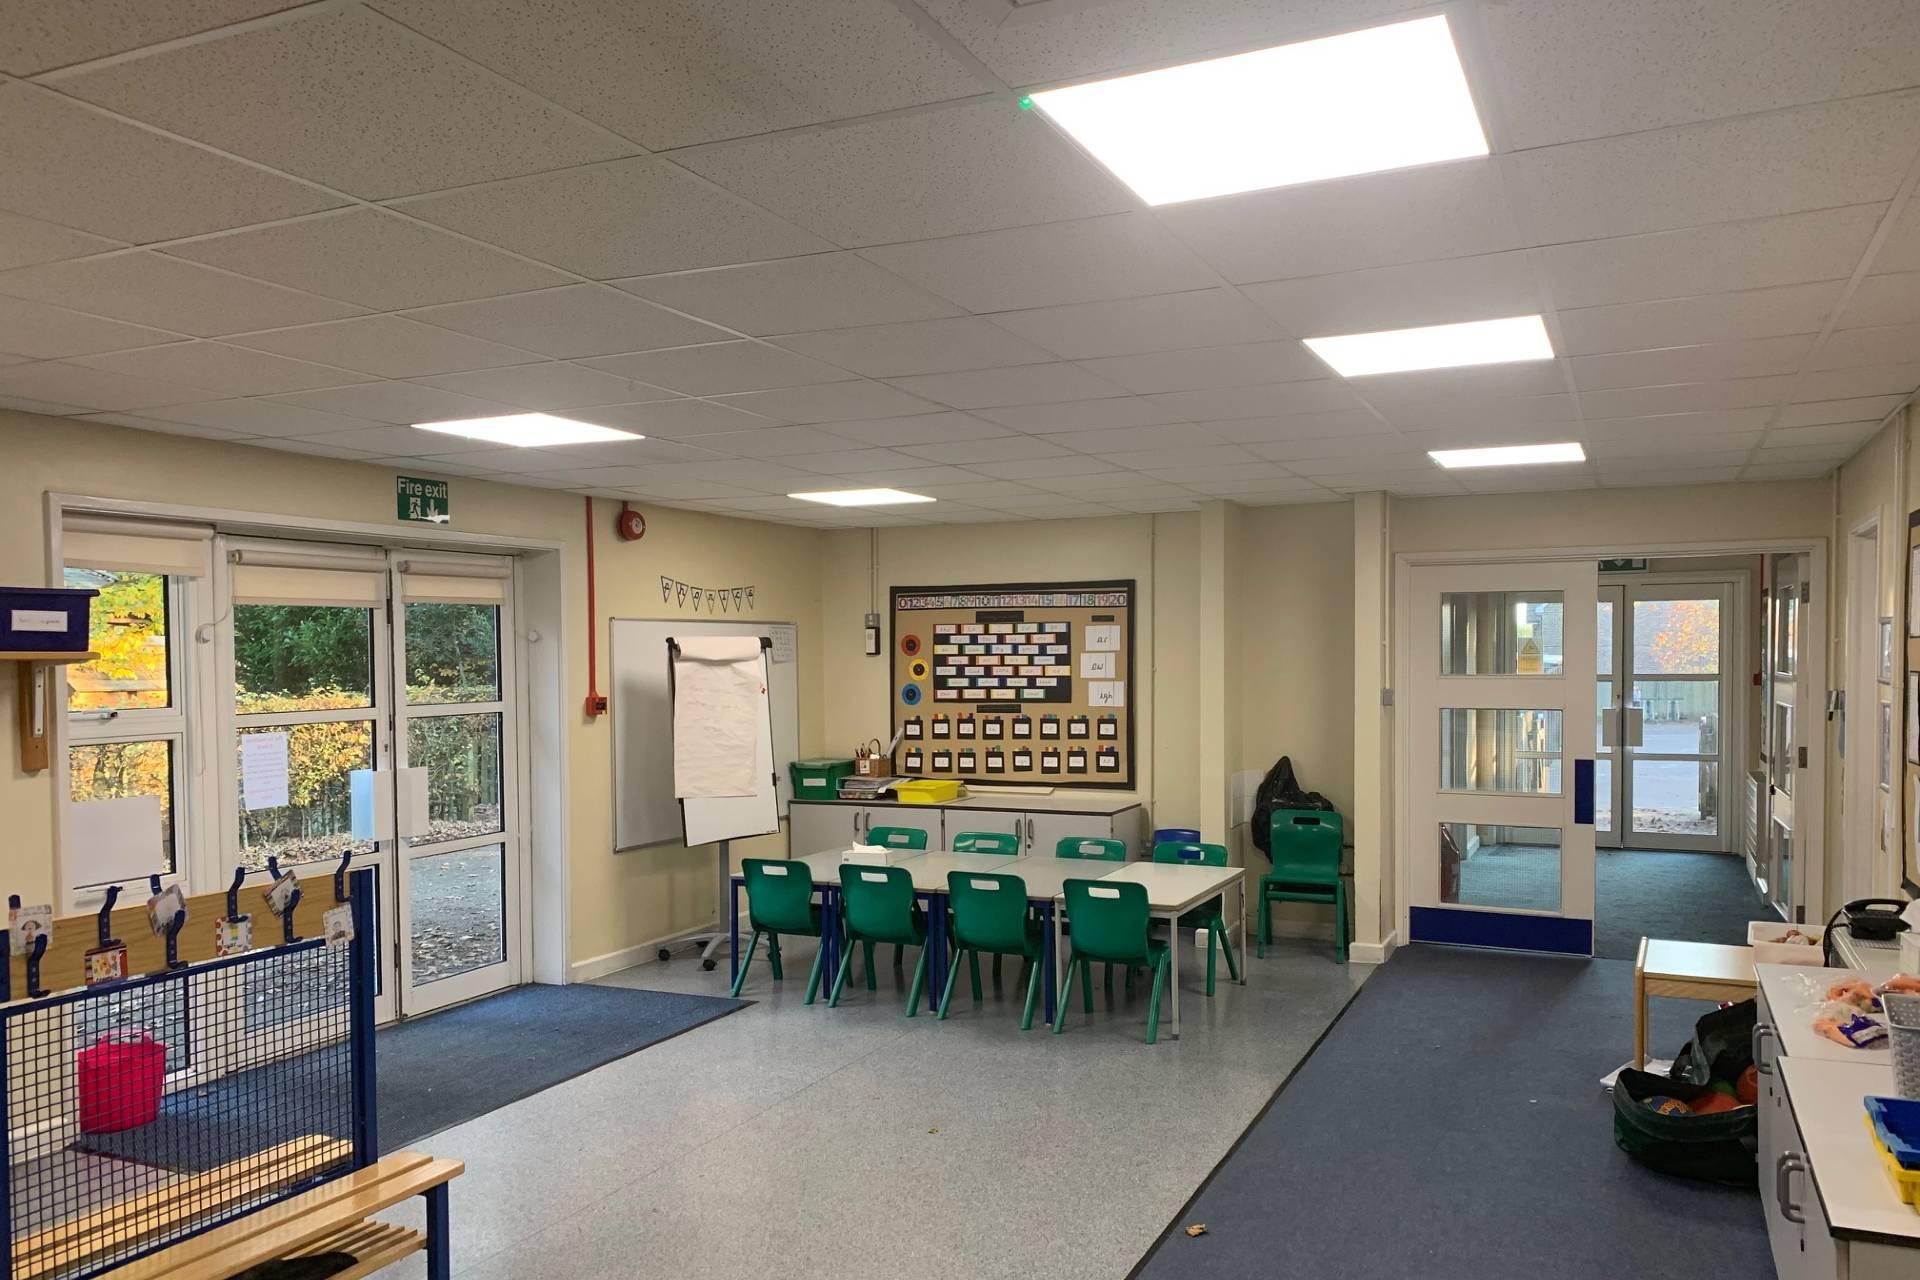 west-borough-primary-school